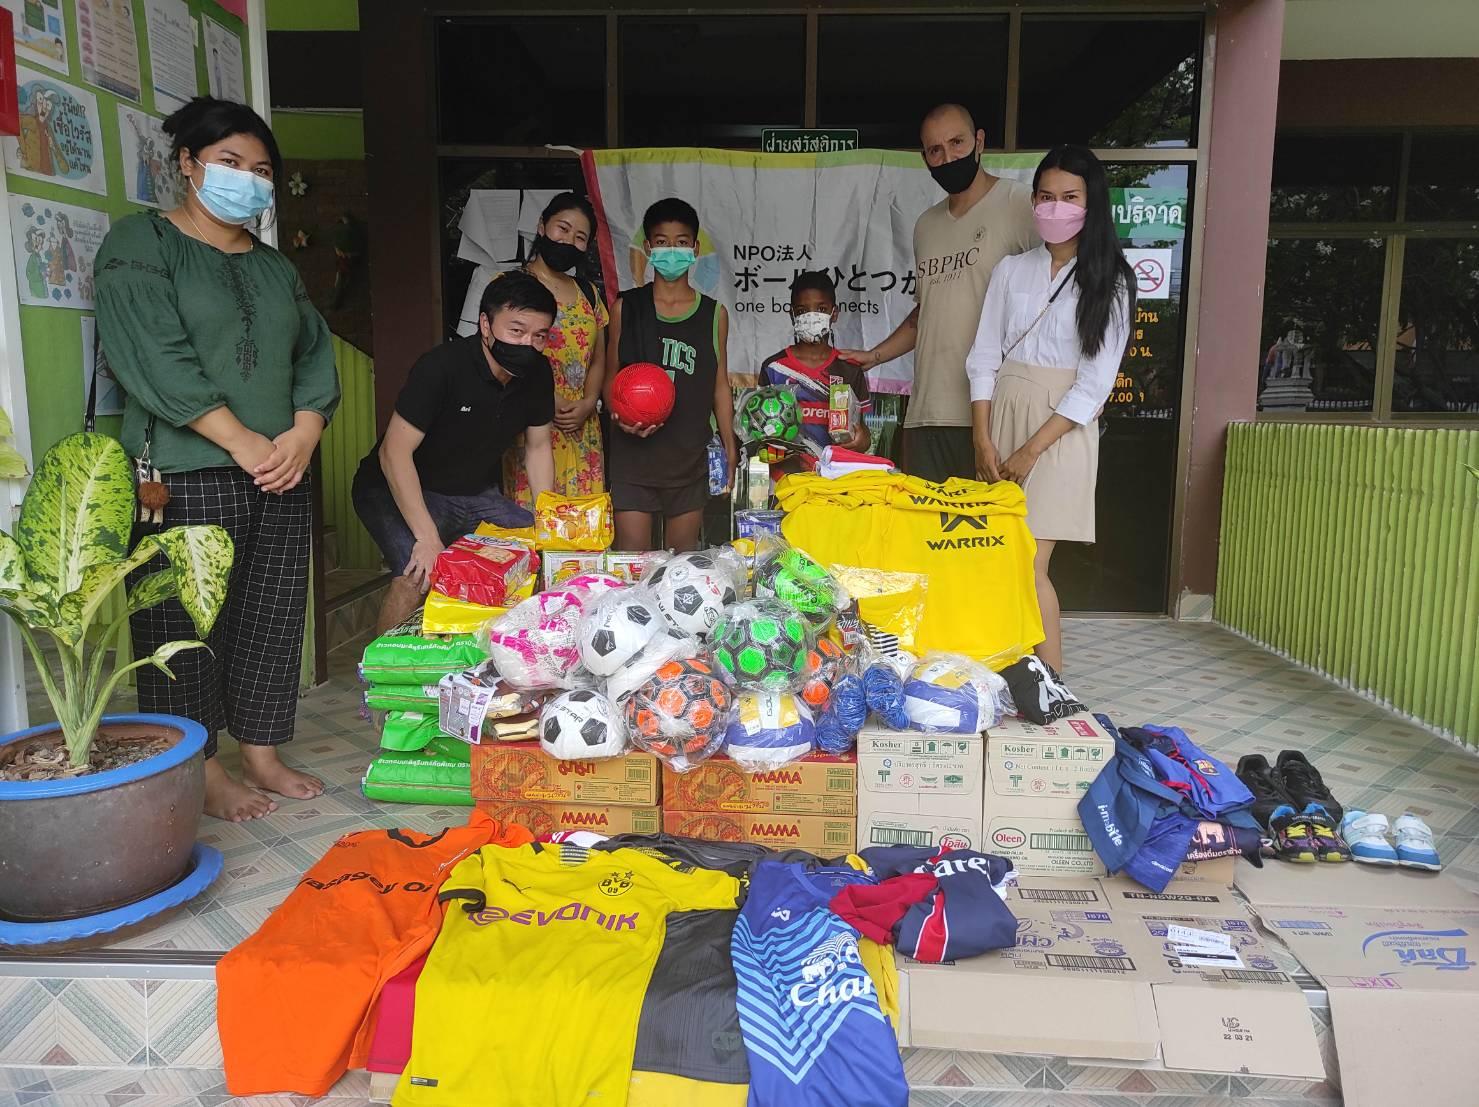 NPOボールひとつが繋ぐ縁16 タイ王国 バンコク bannmahamek LIVE支援(2021年4月17日)